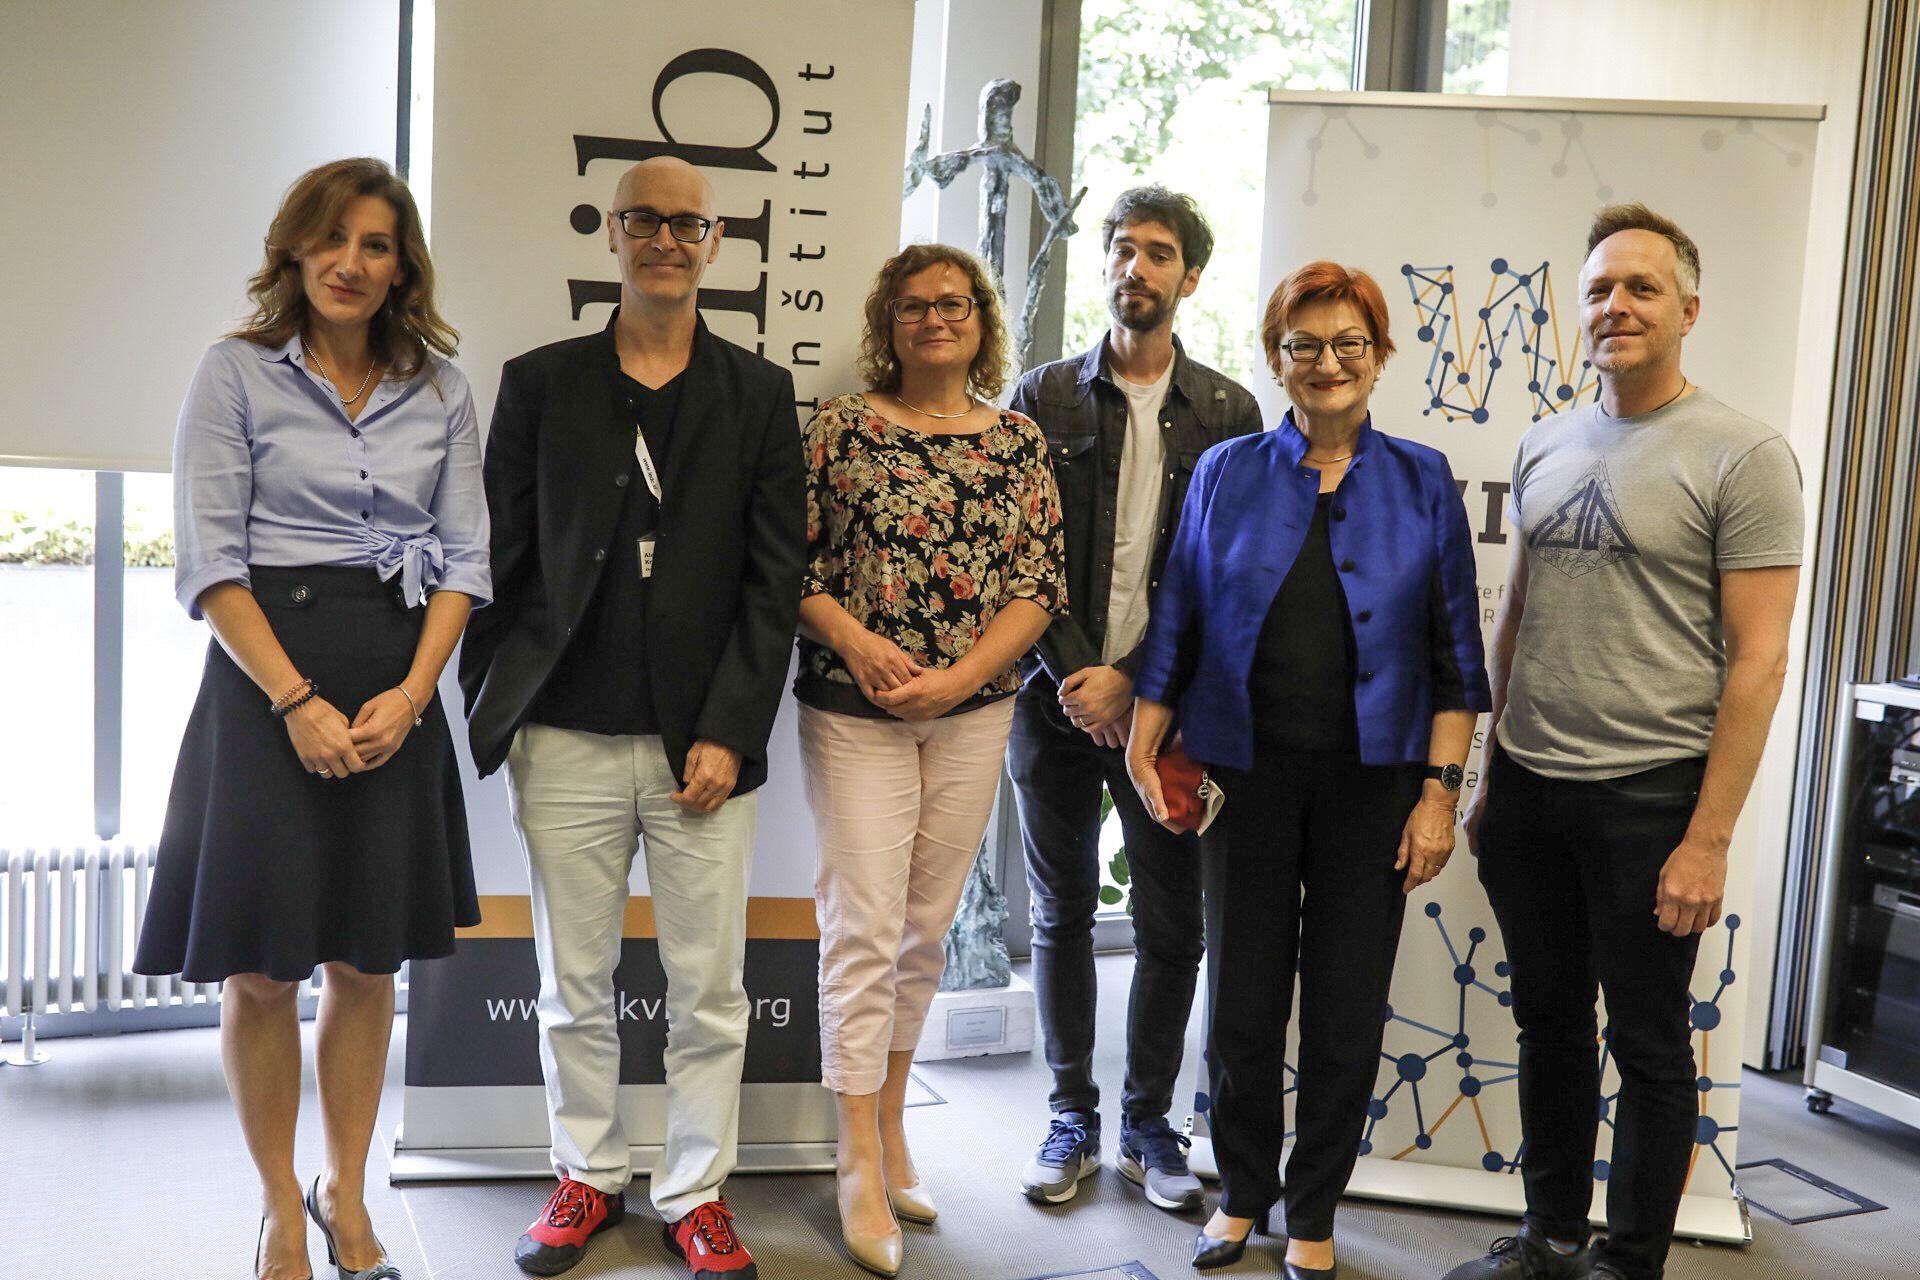 Natasa Lazareski, Aleš Kranjc Kušlan, Sonja Klopčič, Miha Blažič, Danica Purg, Matej Fegus